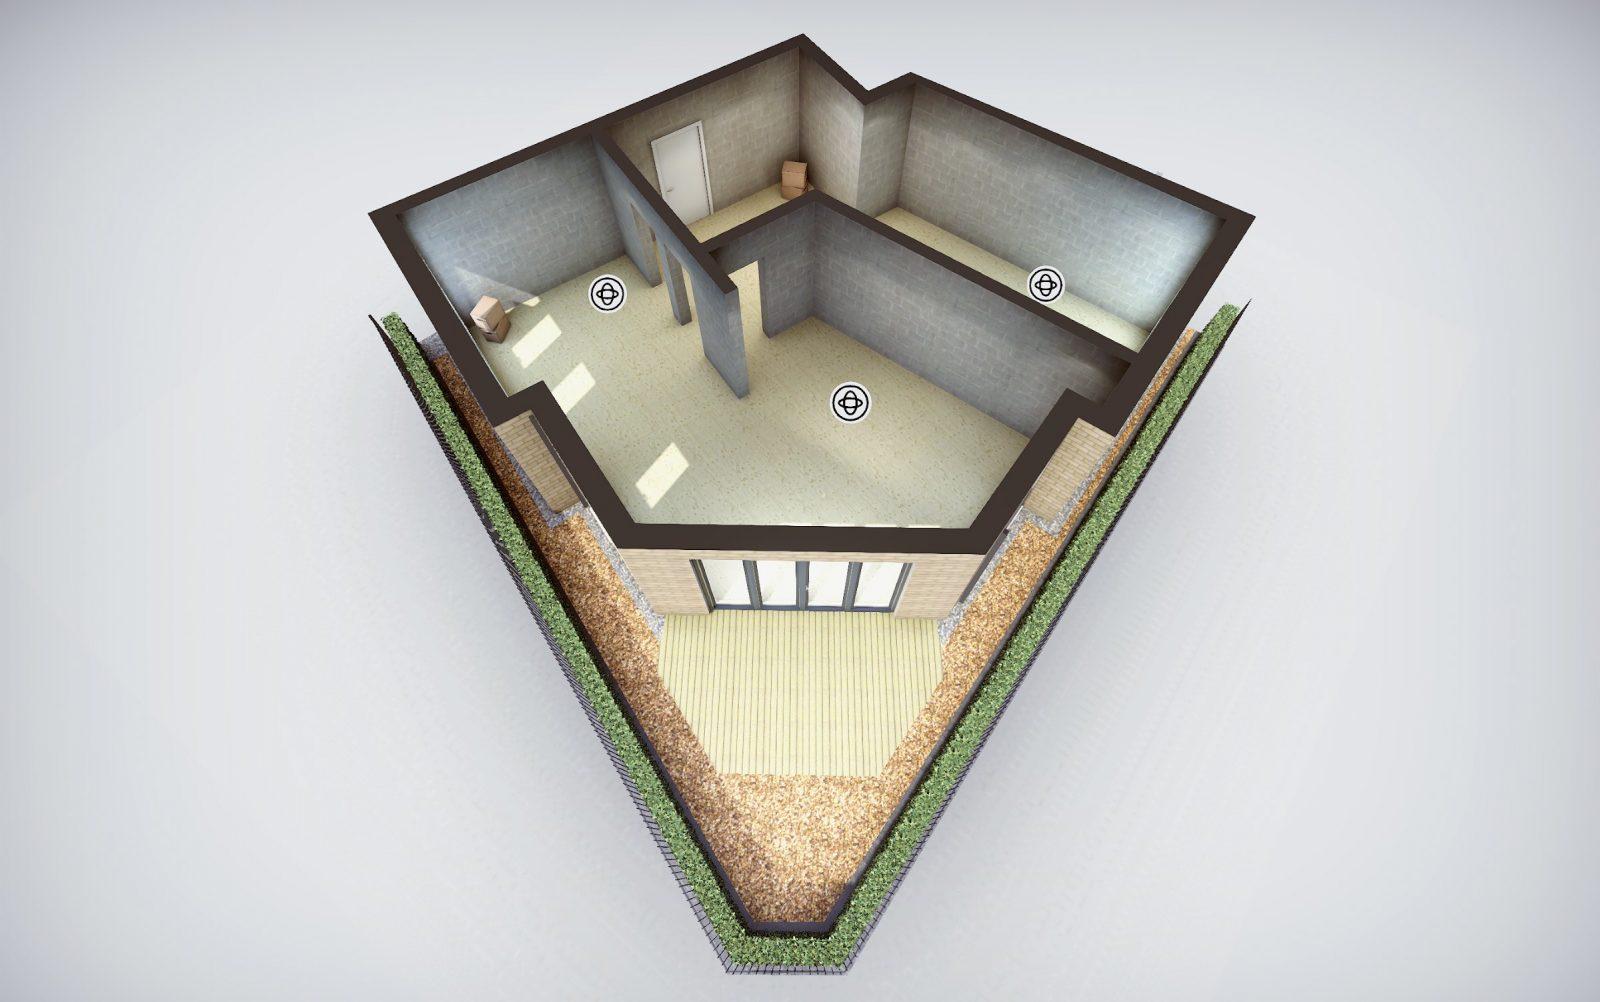 Goldcrest's shell scheme plan 2